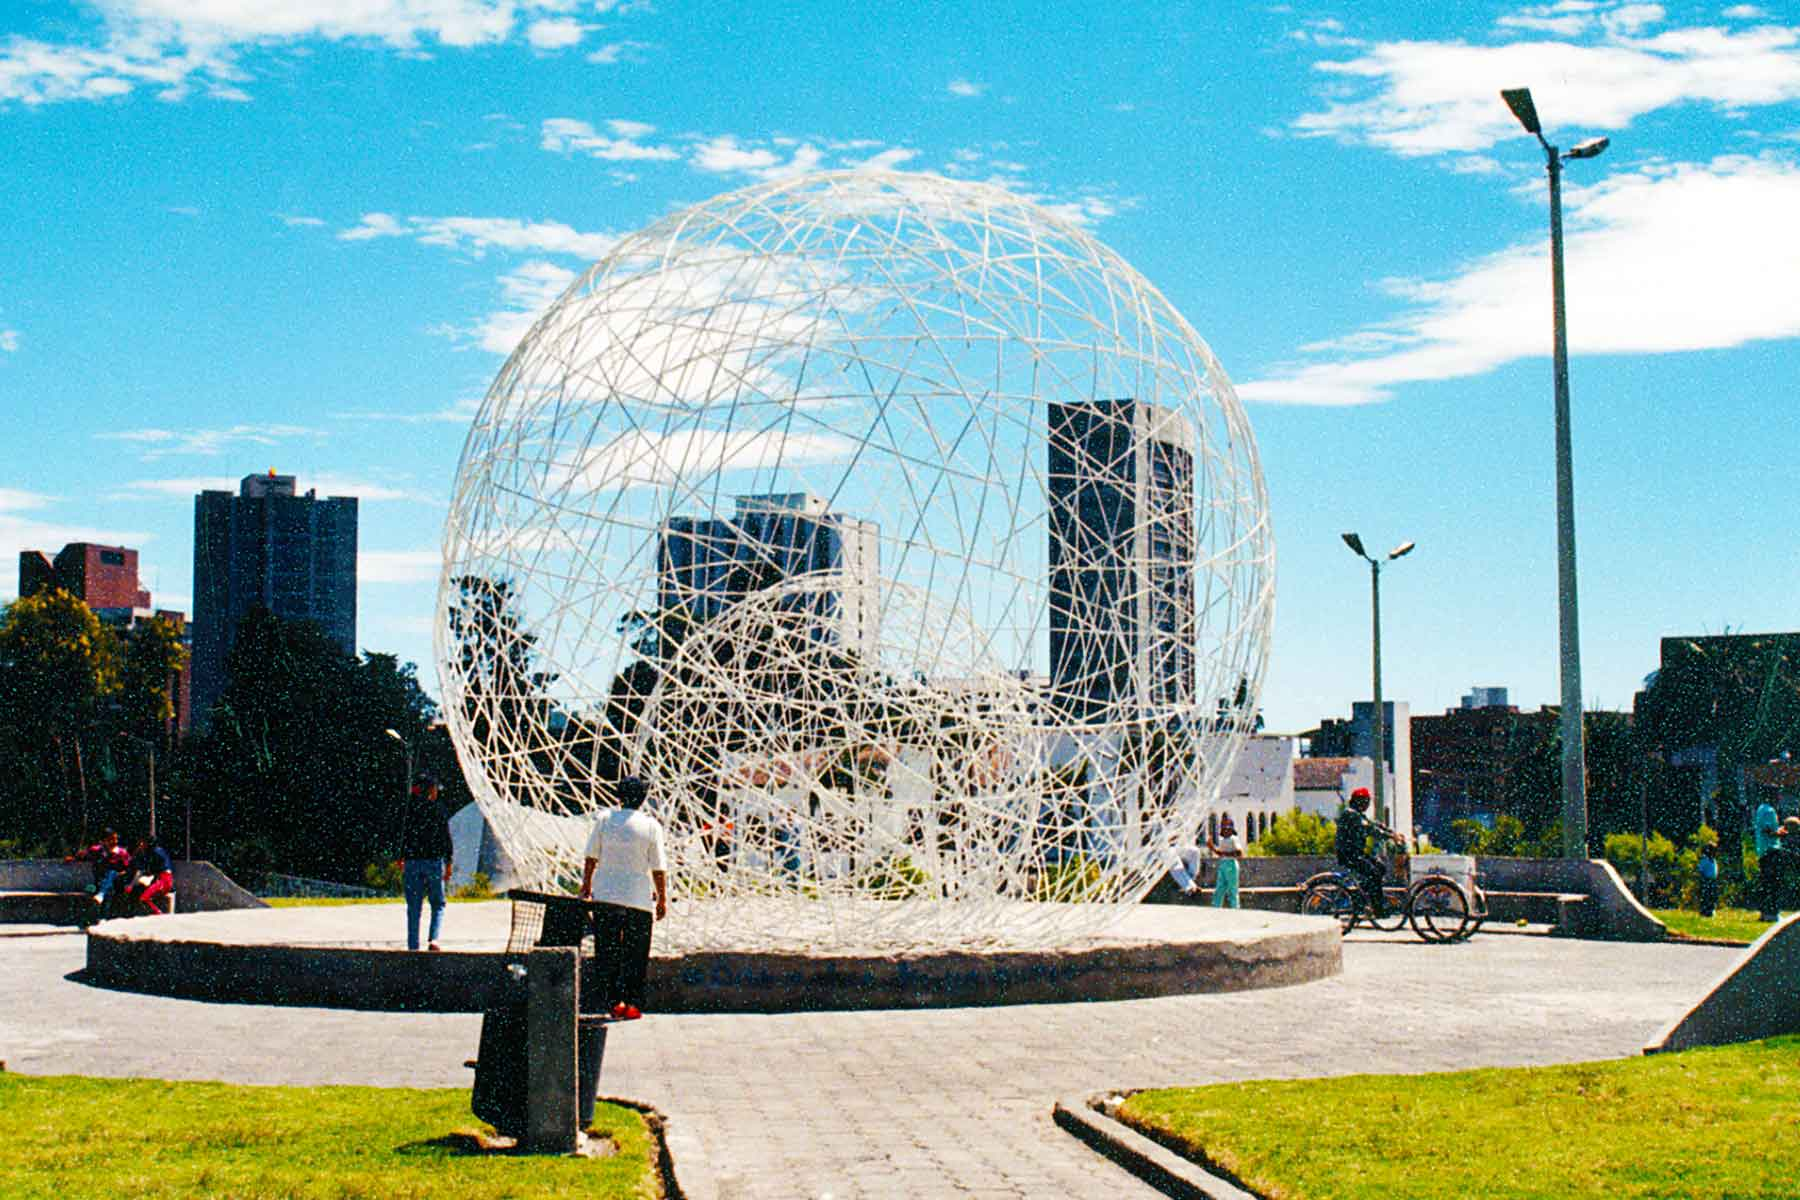 Quito Ecuador | Steven Andrew Martin | South America | Travel Journal | Dr Steven Martin